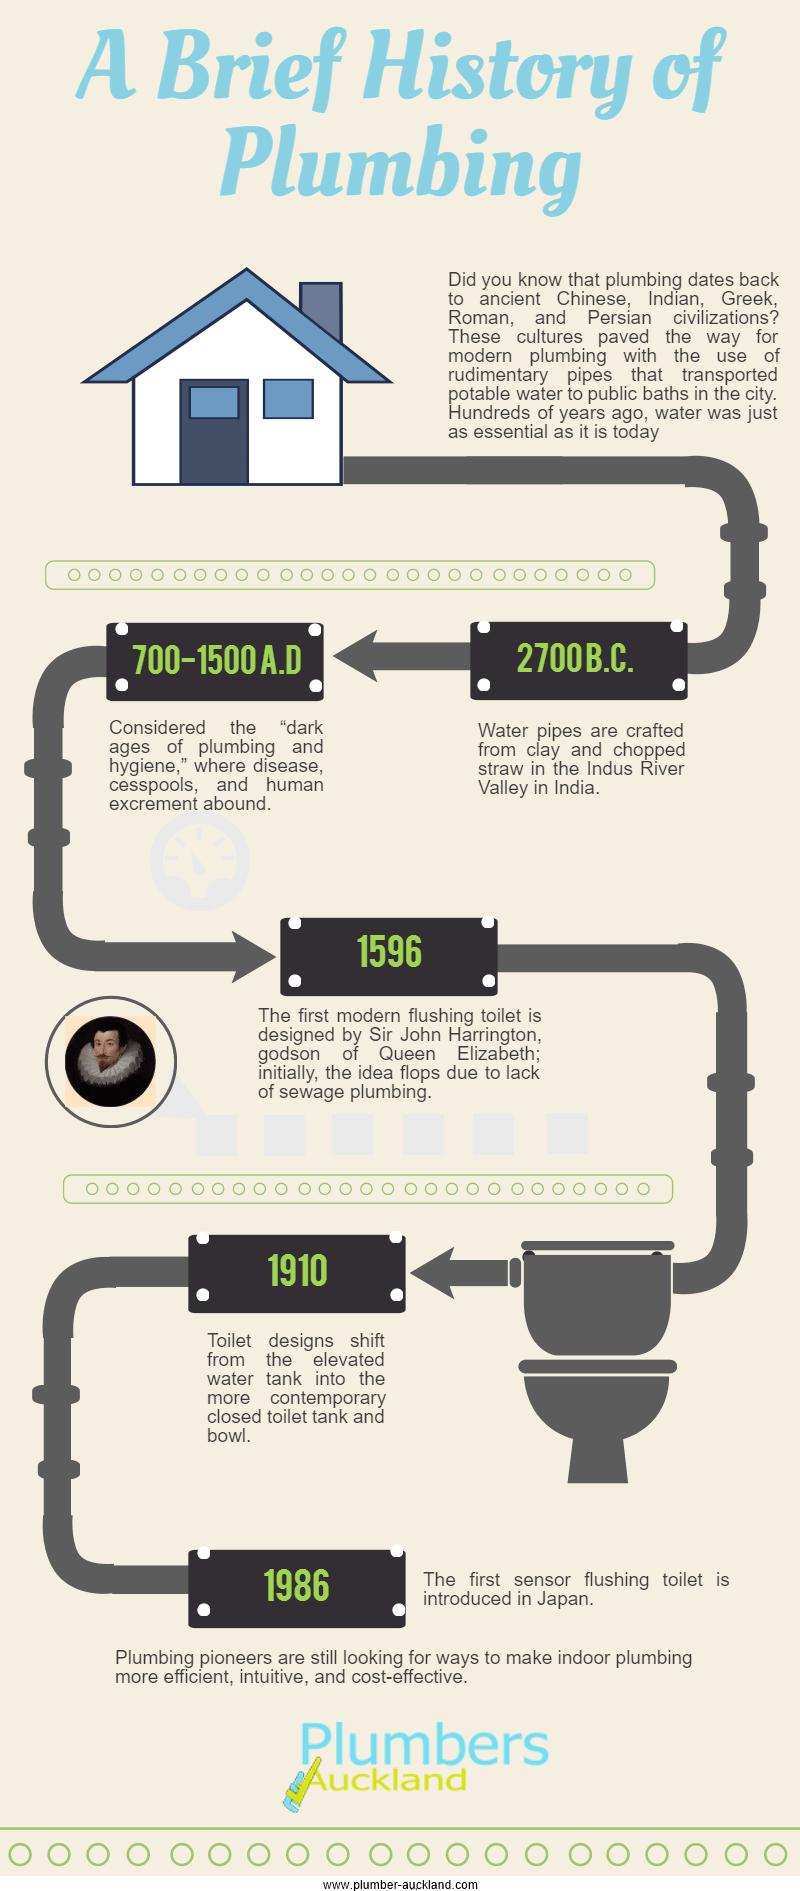 Plumbing through the Years